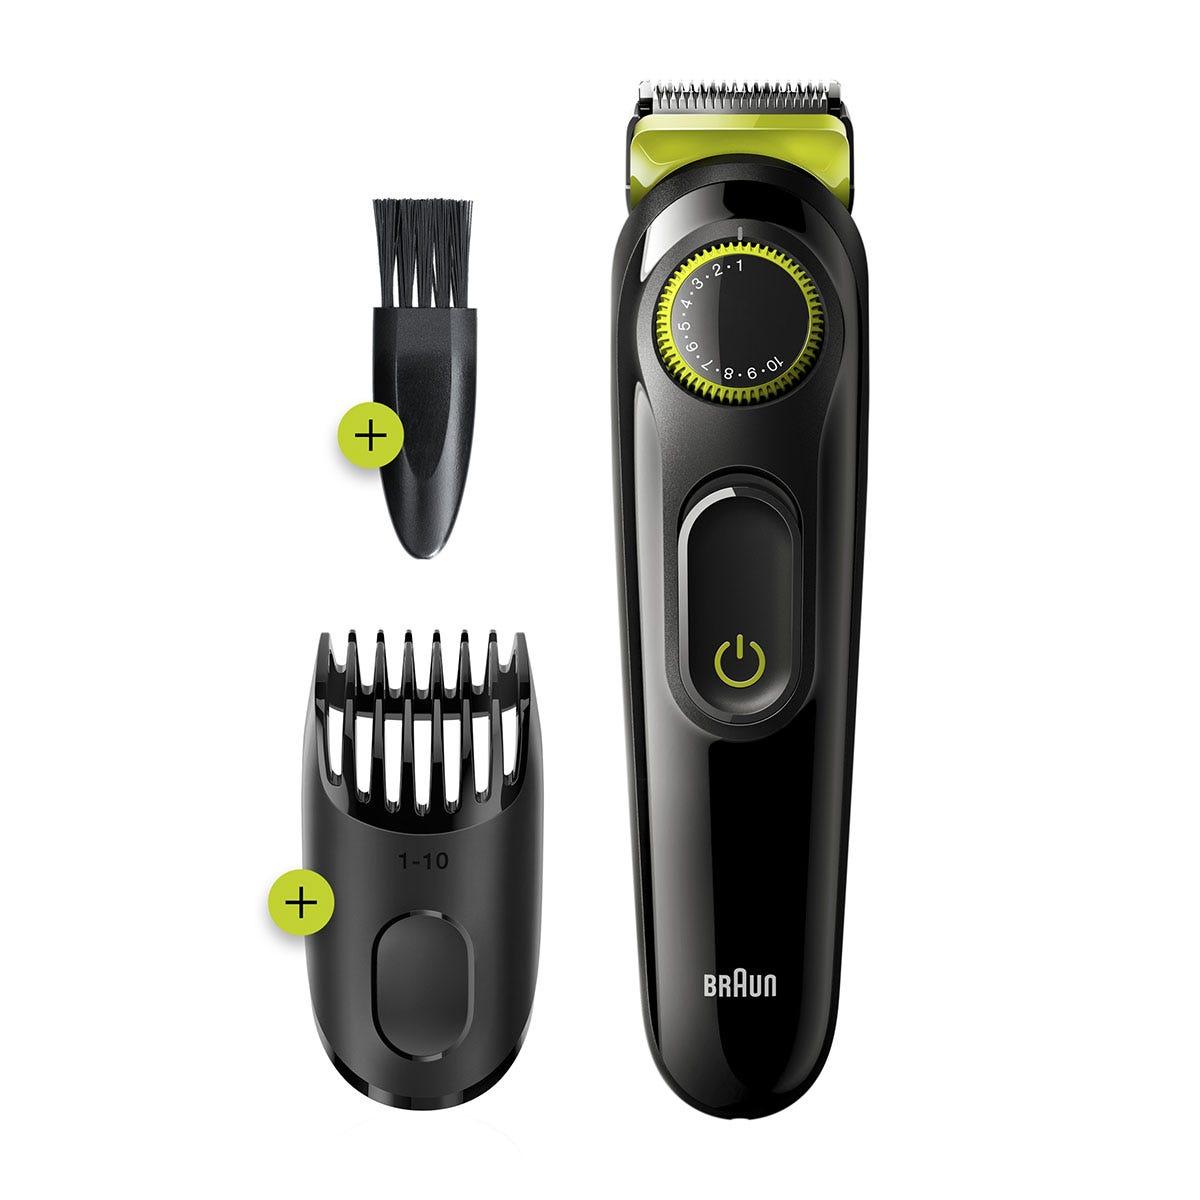 Braun BT3221 Beard Trimmer and Hair Clipper for Men - Black and Volt Green